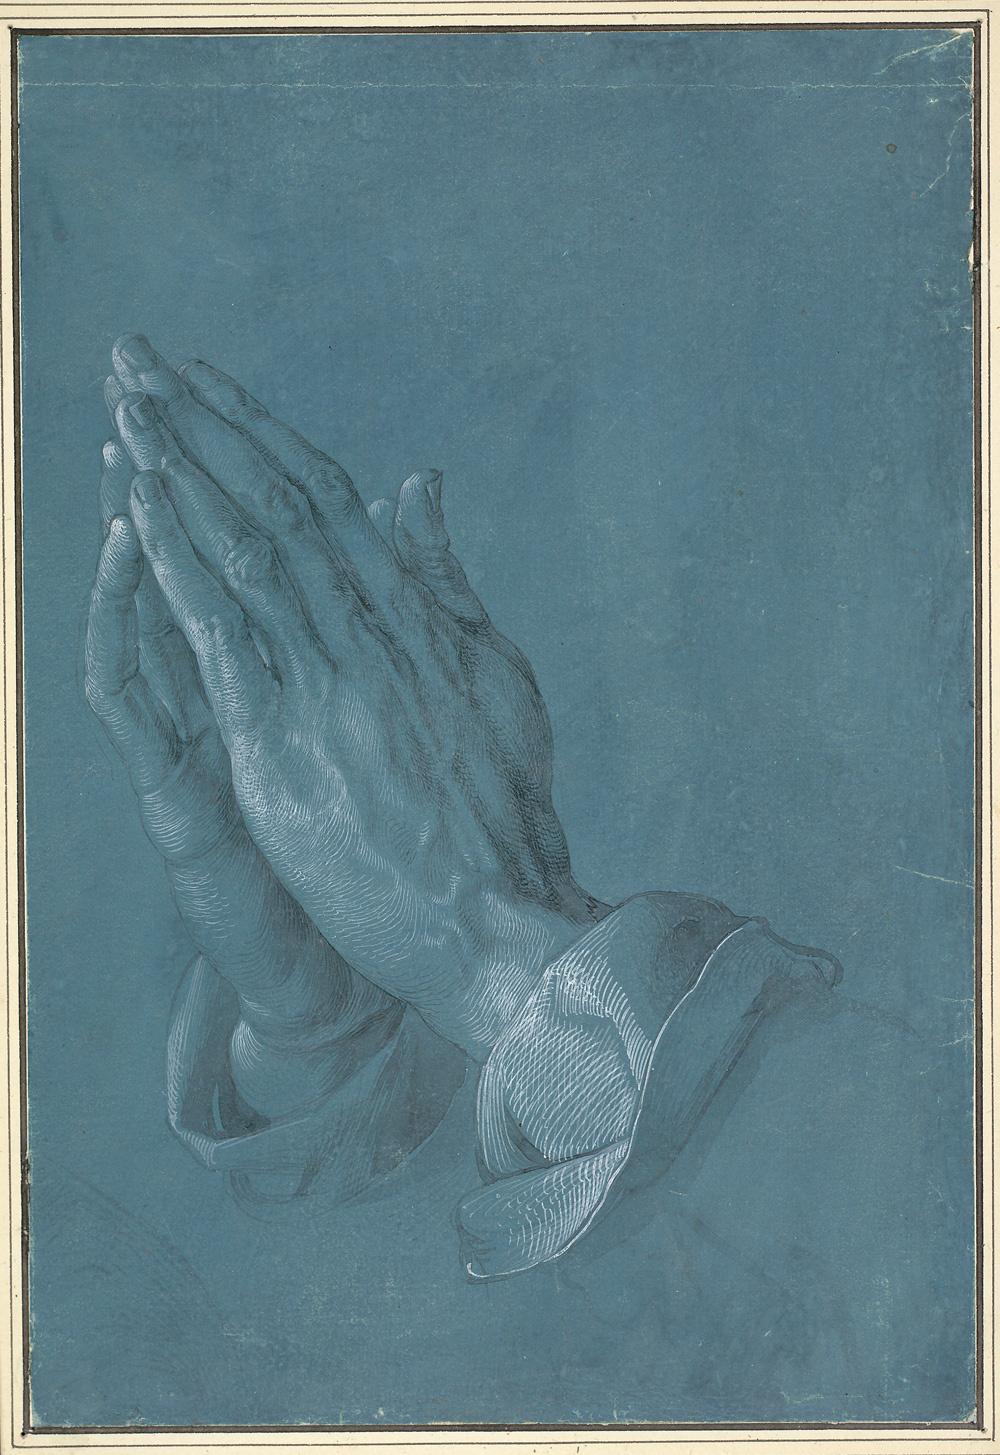 Albrecht Durer. Praying hands (the hands of the Apostle)